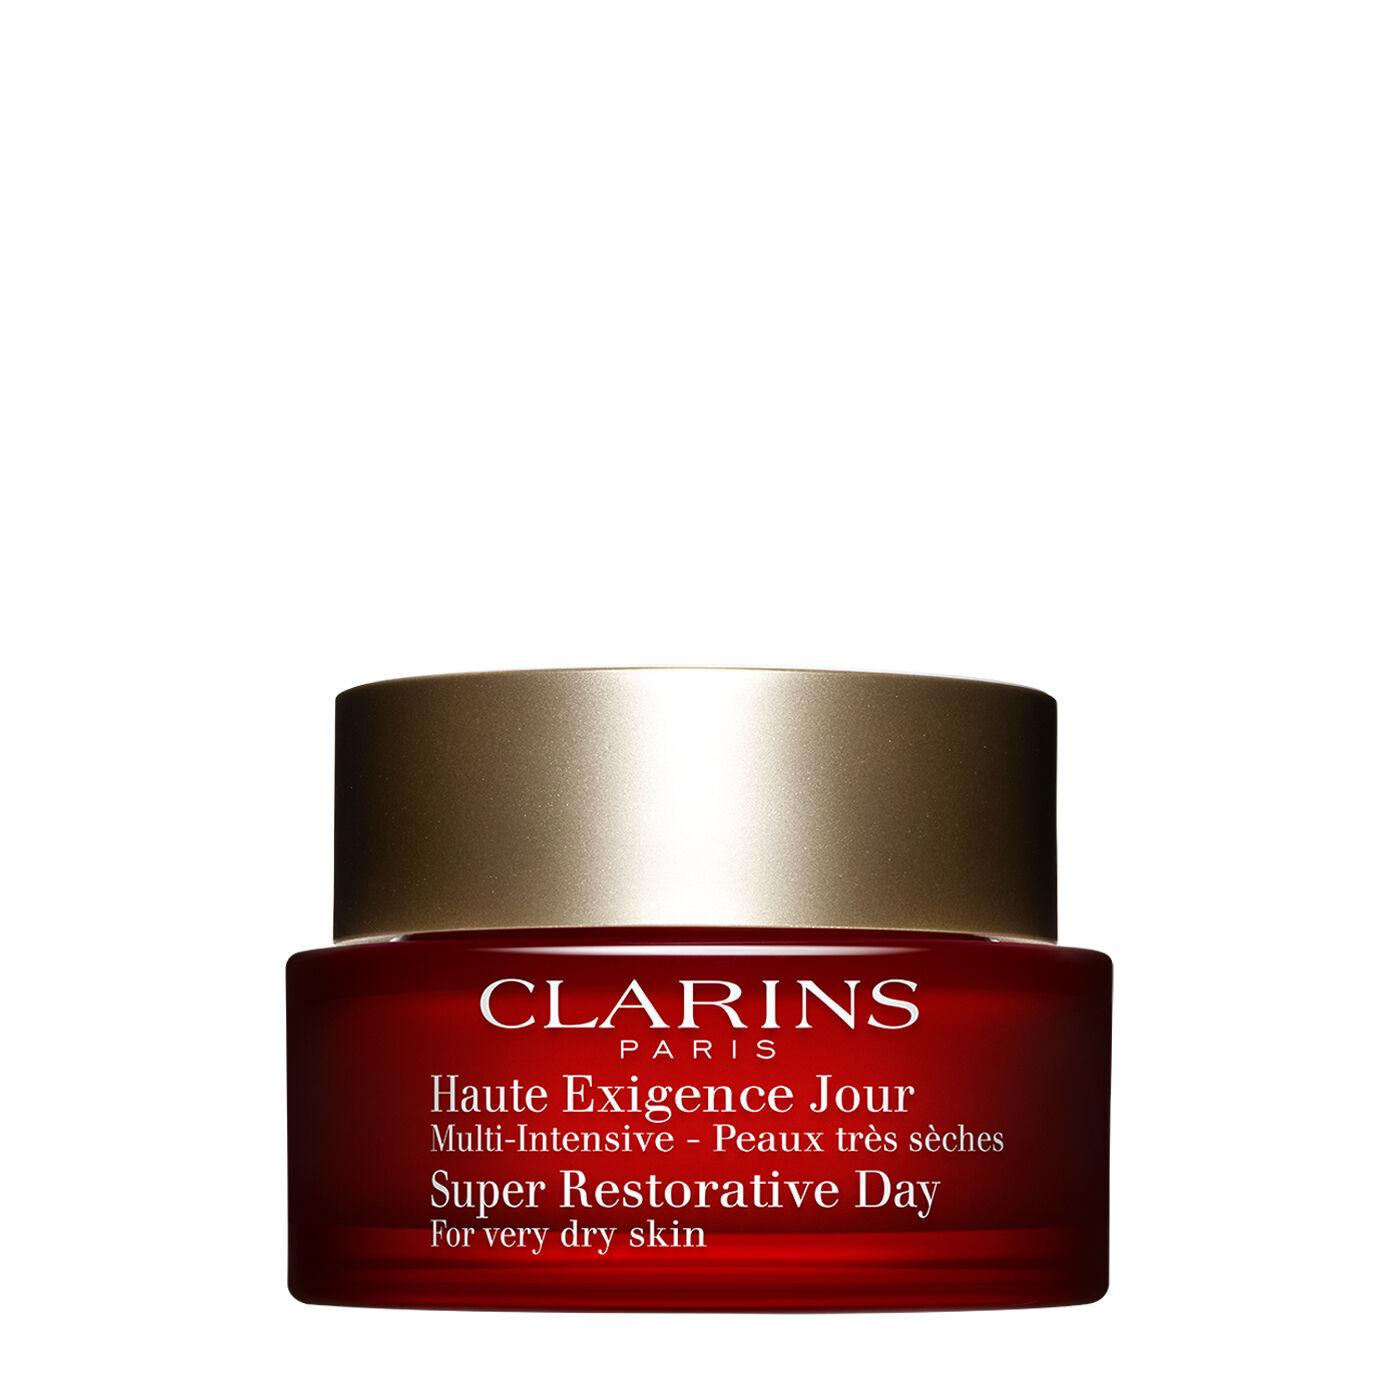 Multi-Intensive Anti-Age Tagescreme Haute Exigence für sehr trockene Haut